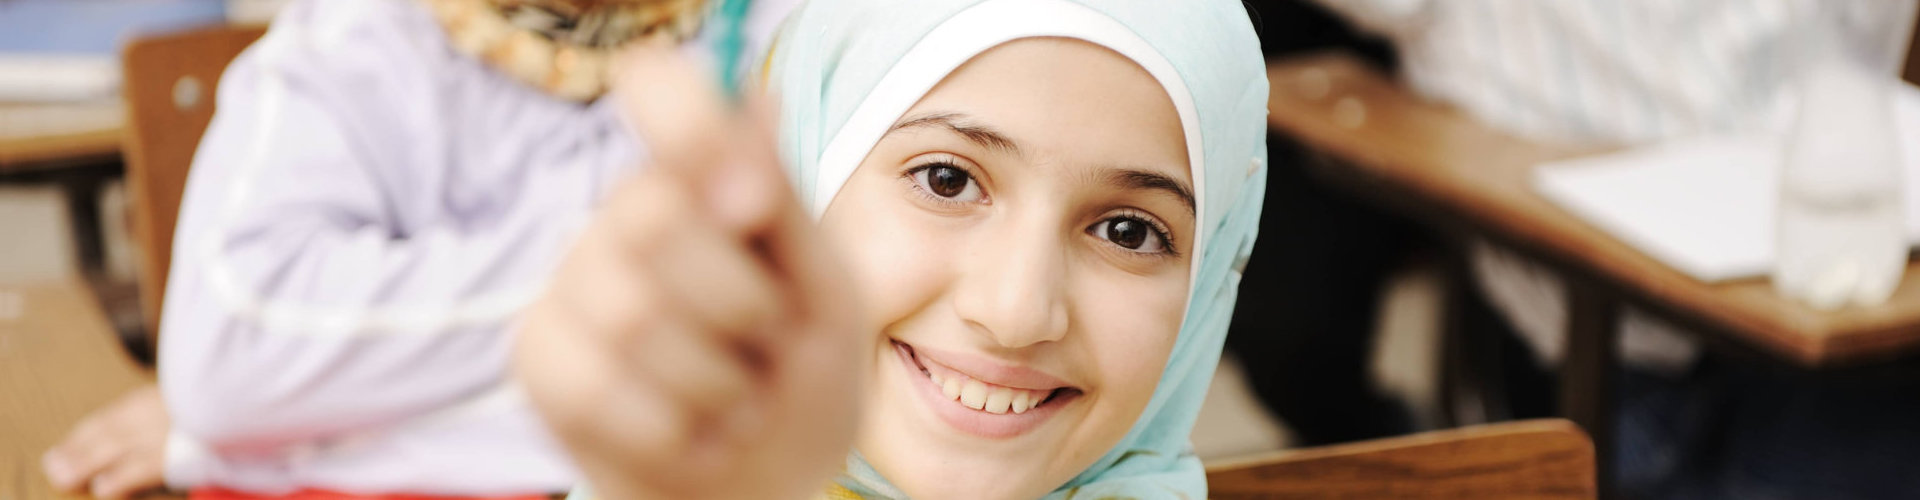 smiling young muslim